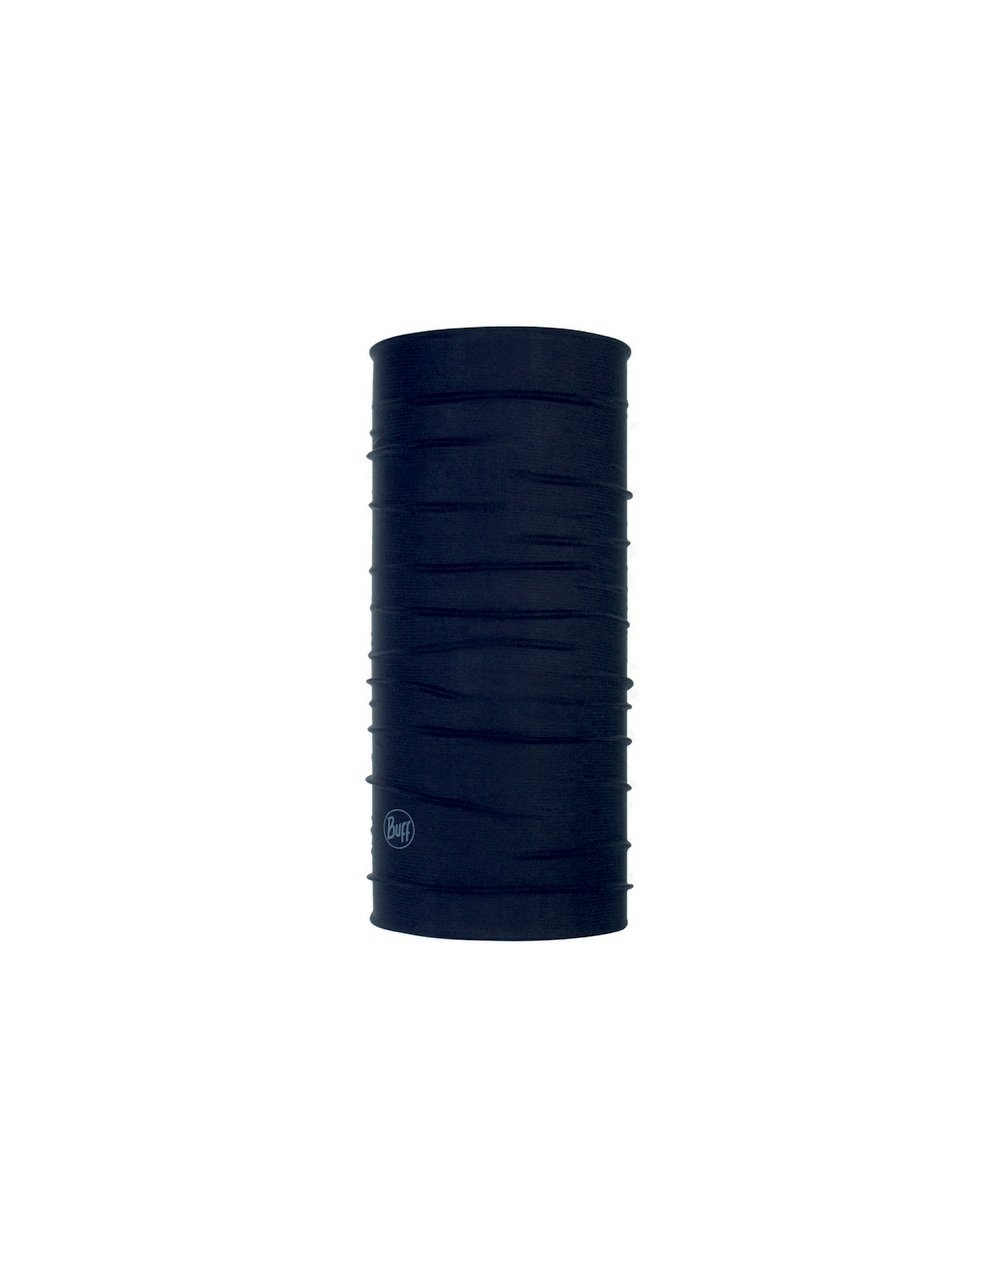 Buff Coolnet UV (119328.999.10.00) Solid Black